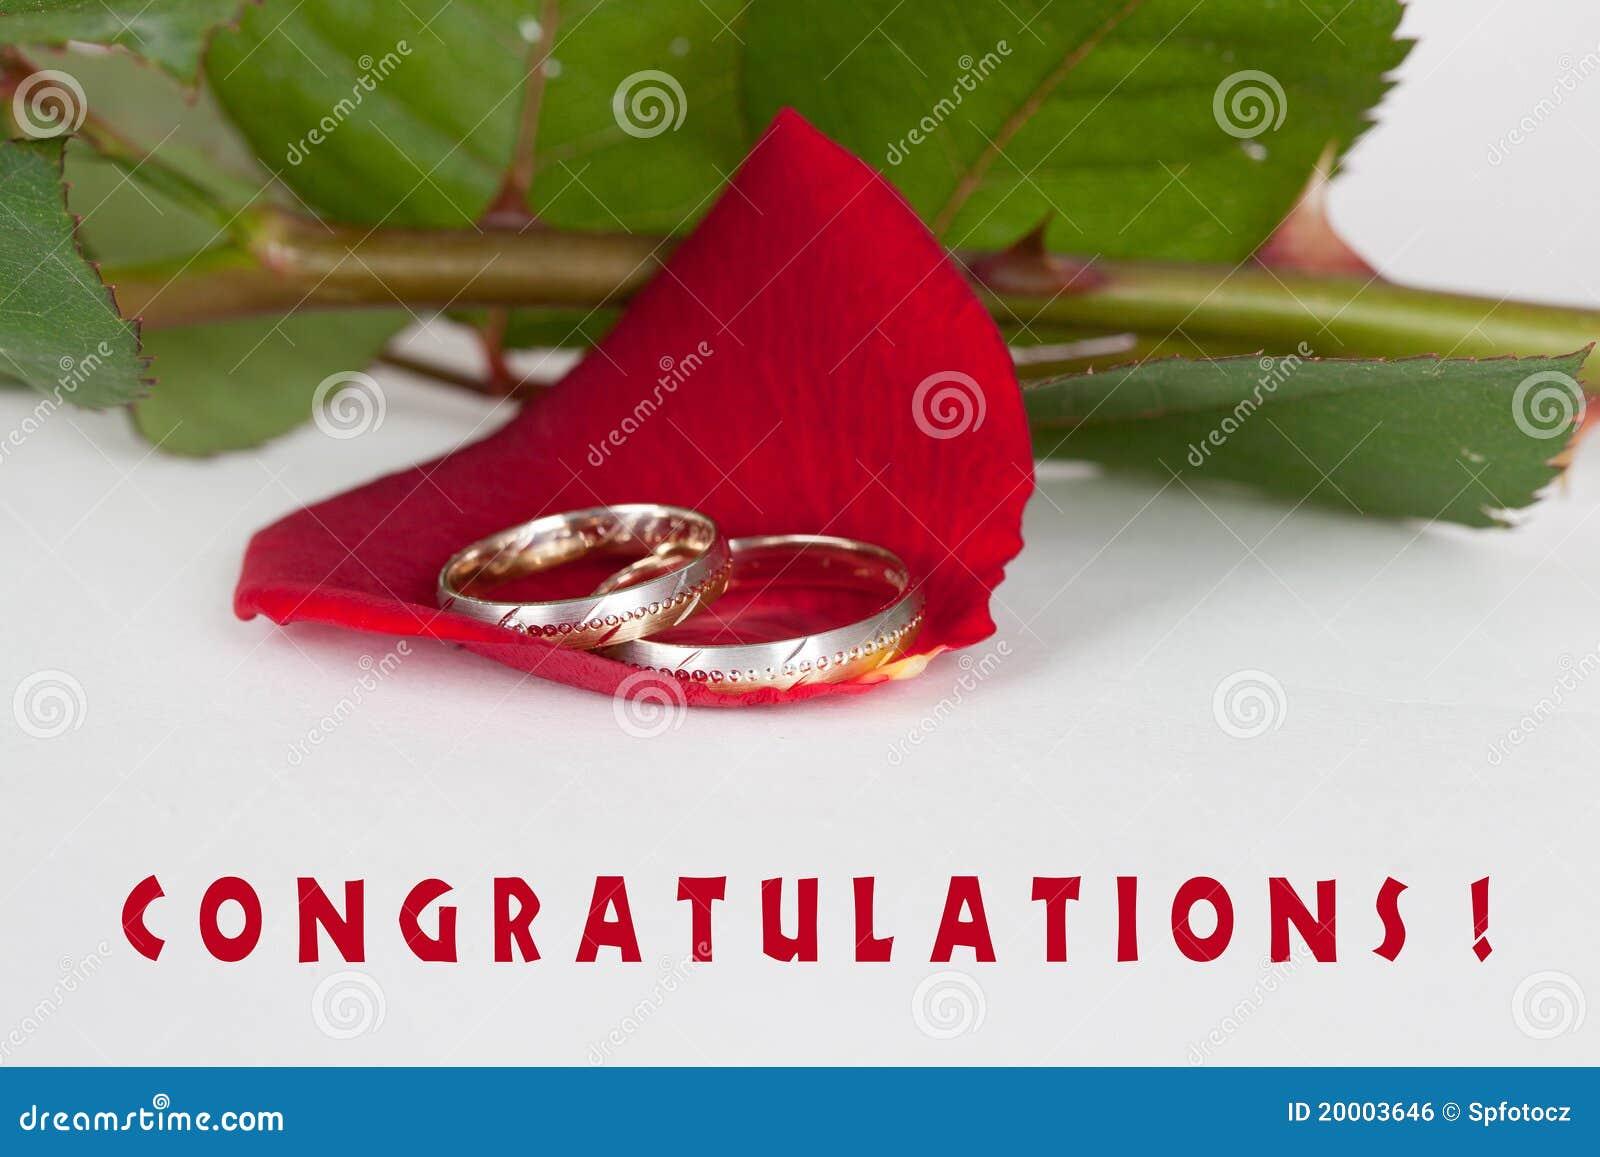 Wedding congratulations stock photo. Image of berries ...